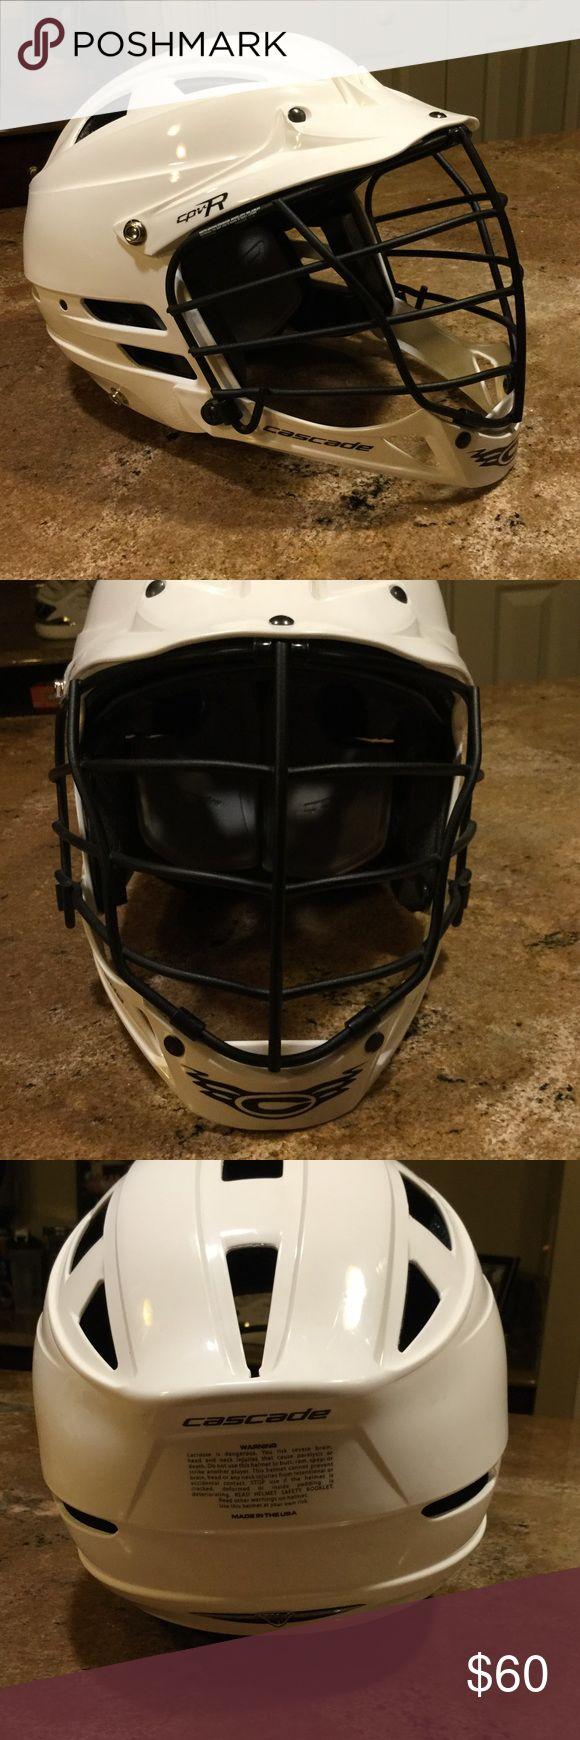 Cascade Lacrosse helmet S/M Worn 1 time only. Men's lacrosse helmet in perfect like new condition Cascade Accessories